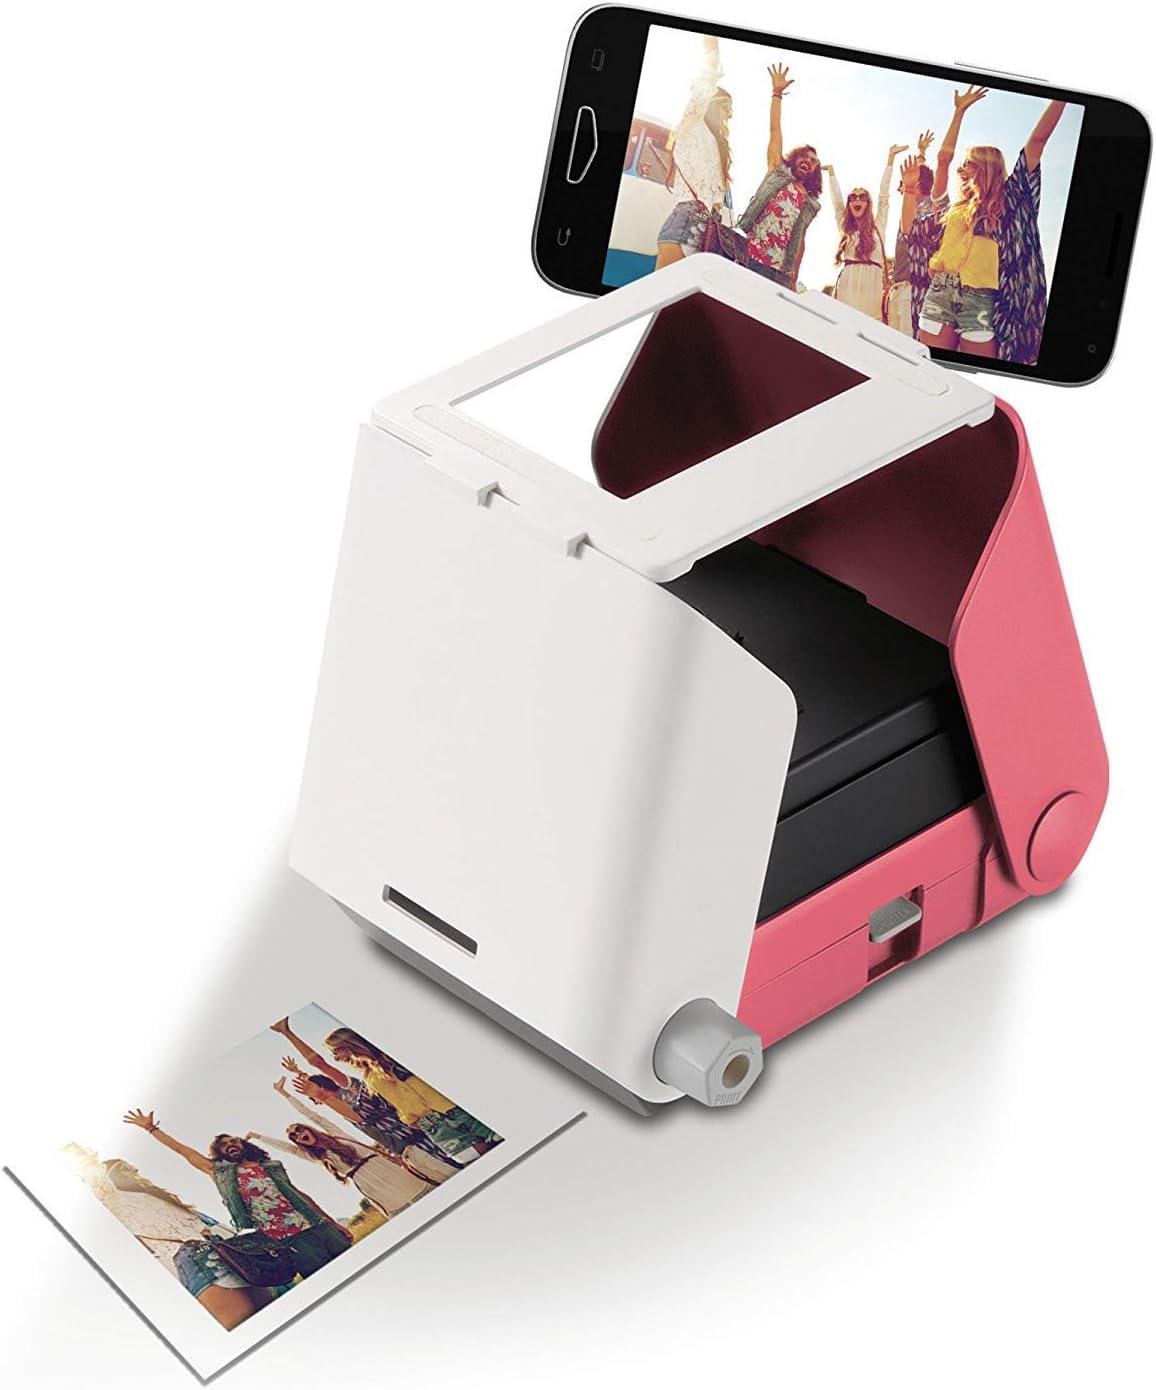 kiipix tm3362 Kit Impresora fotográfica para Smartphone con ...